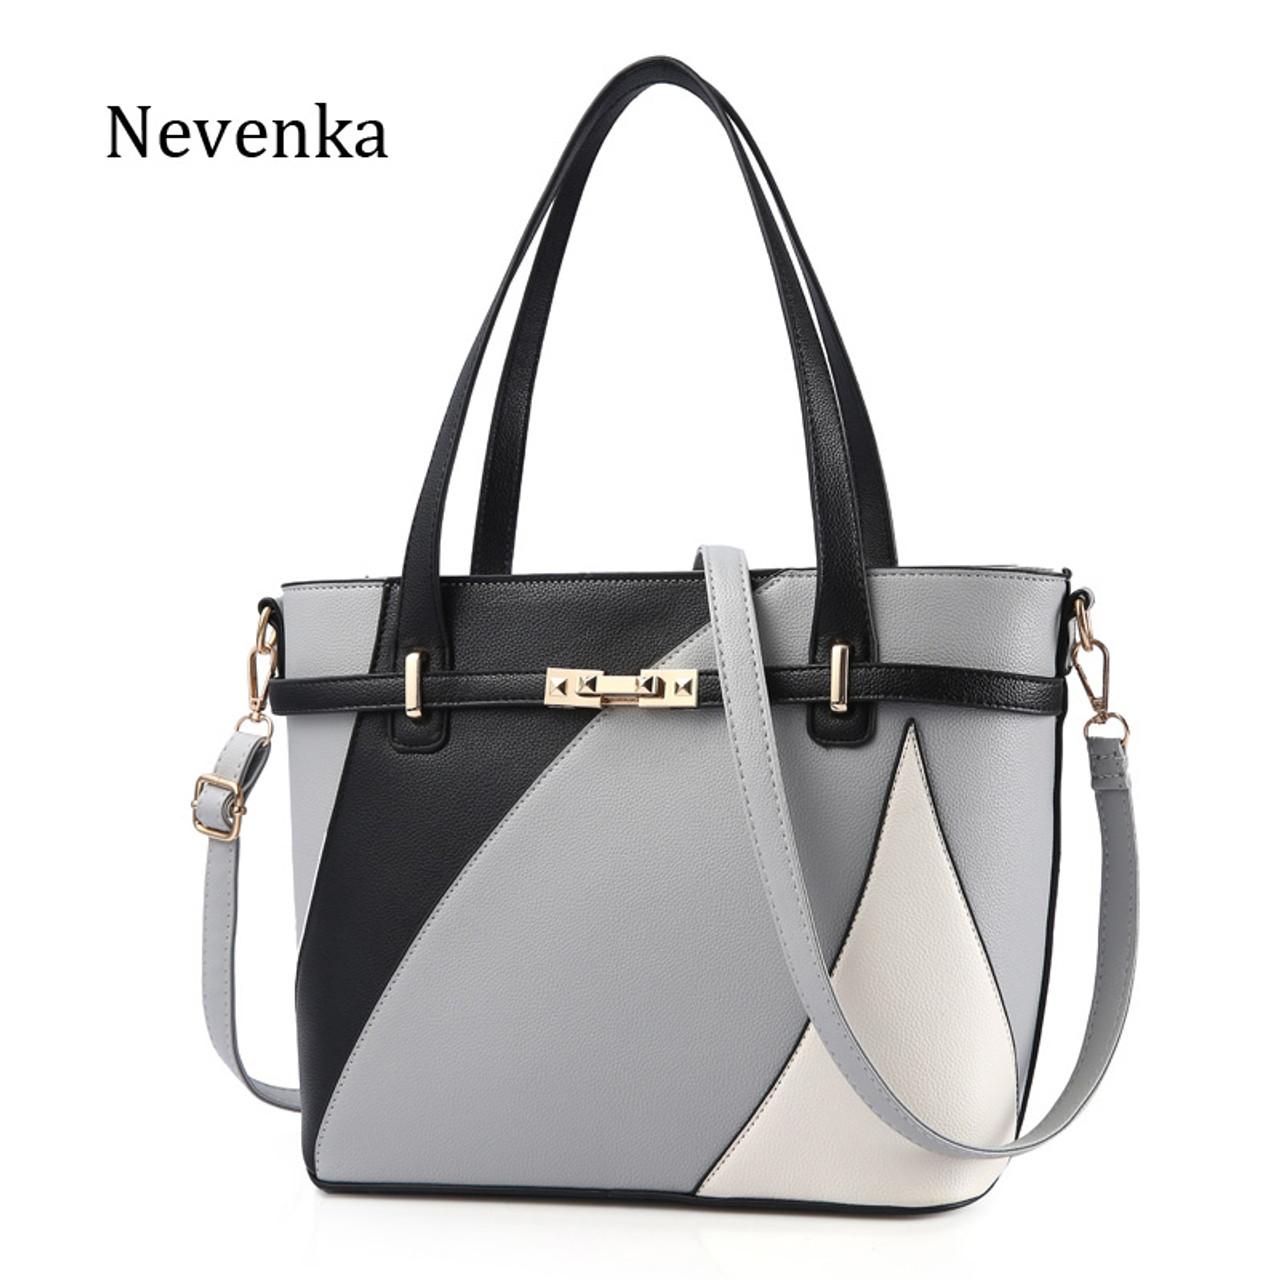 848afd45b431 Nevenka New Design Women Fashion Style Handbag Female Luxury Chains Bags  Sequined Zipper Messenger Bag Quality ...